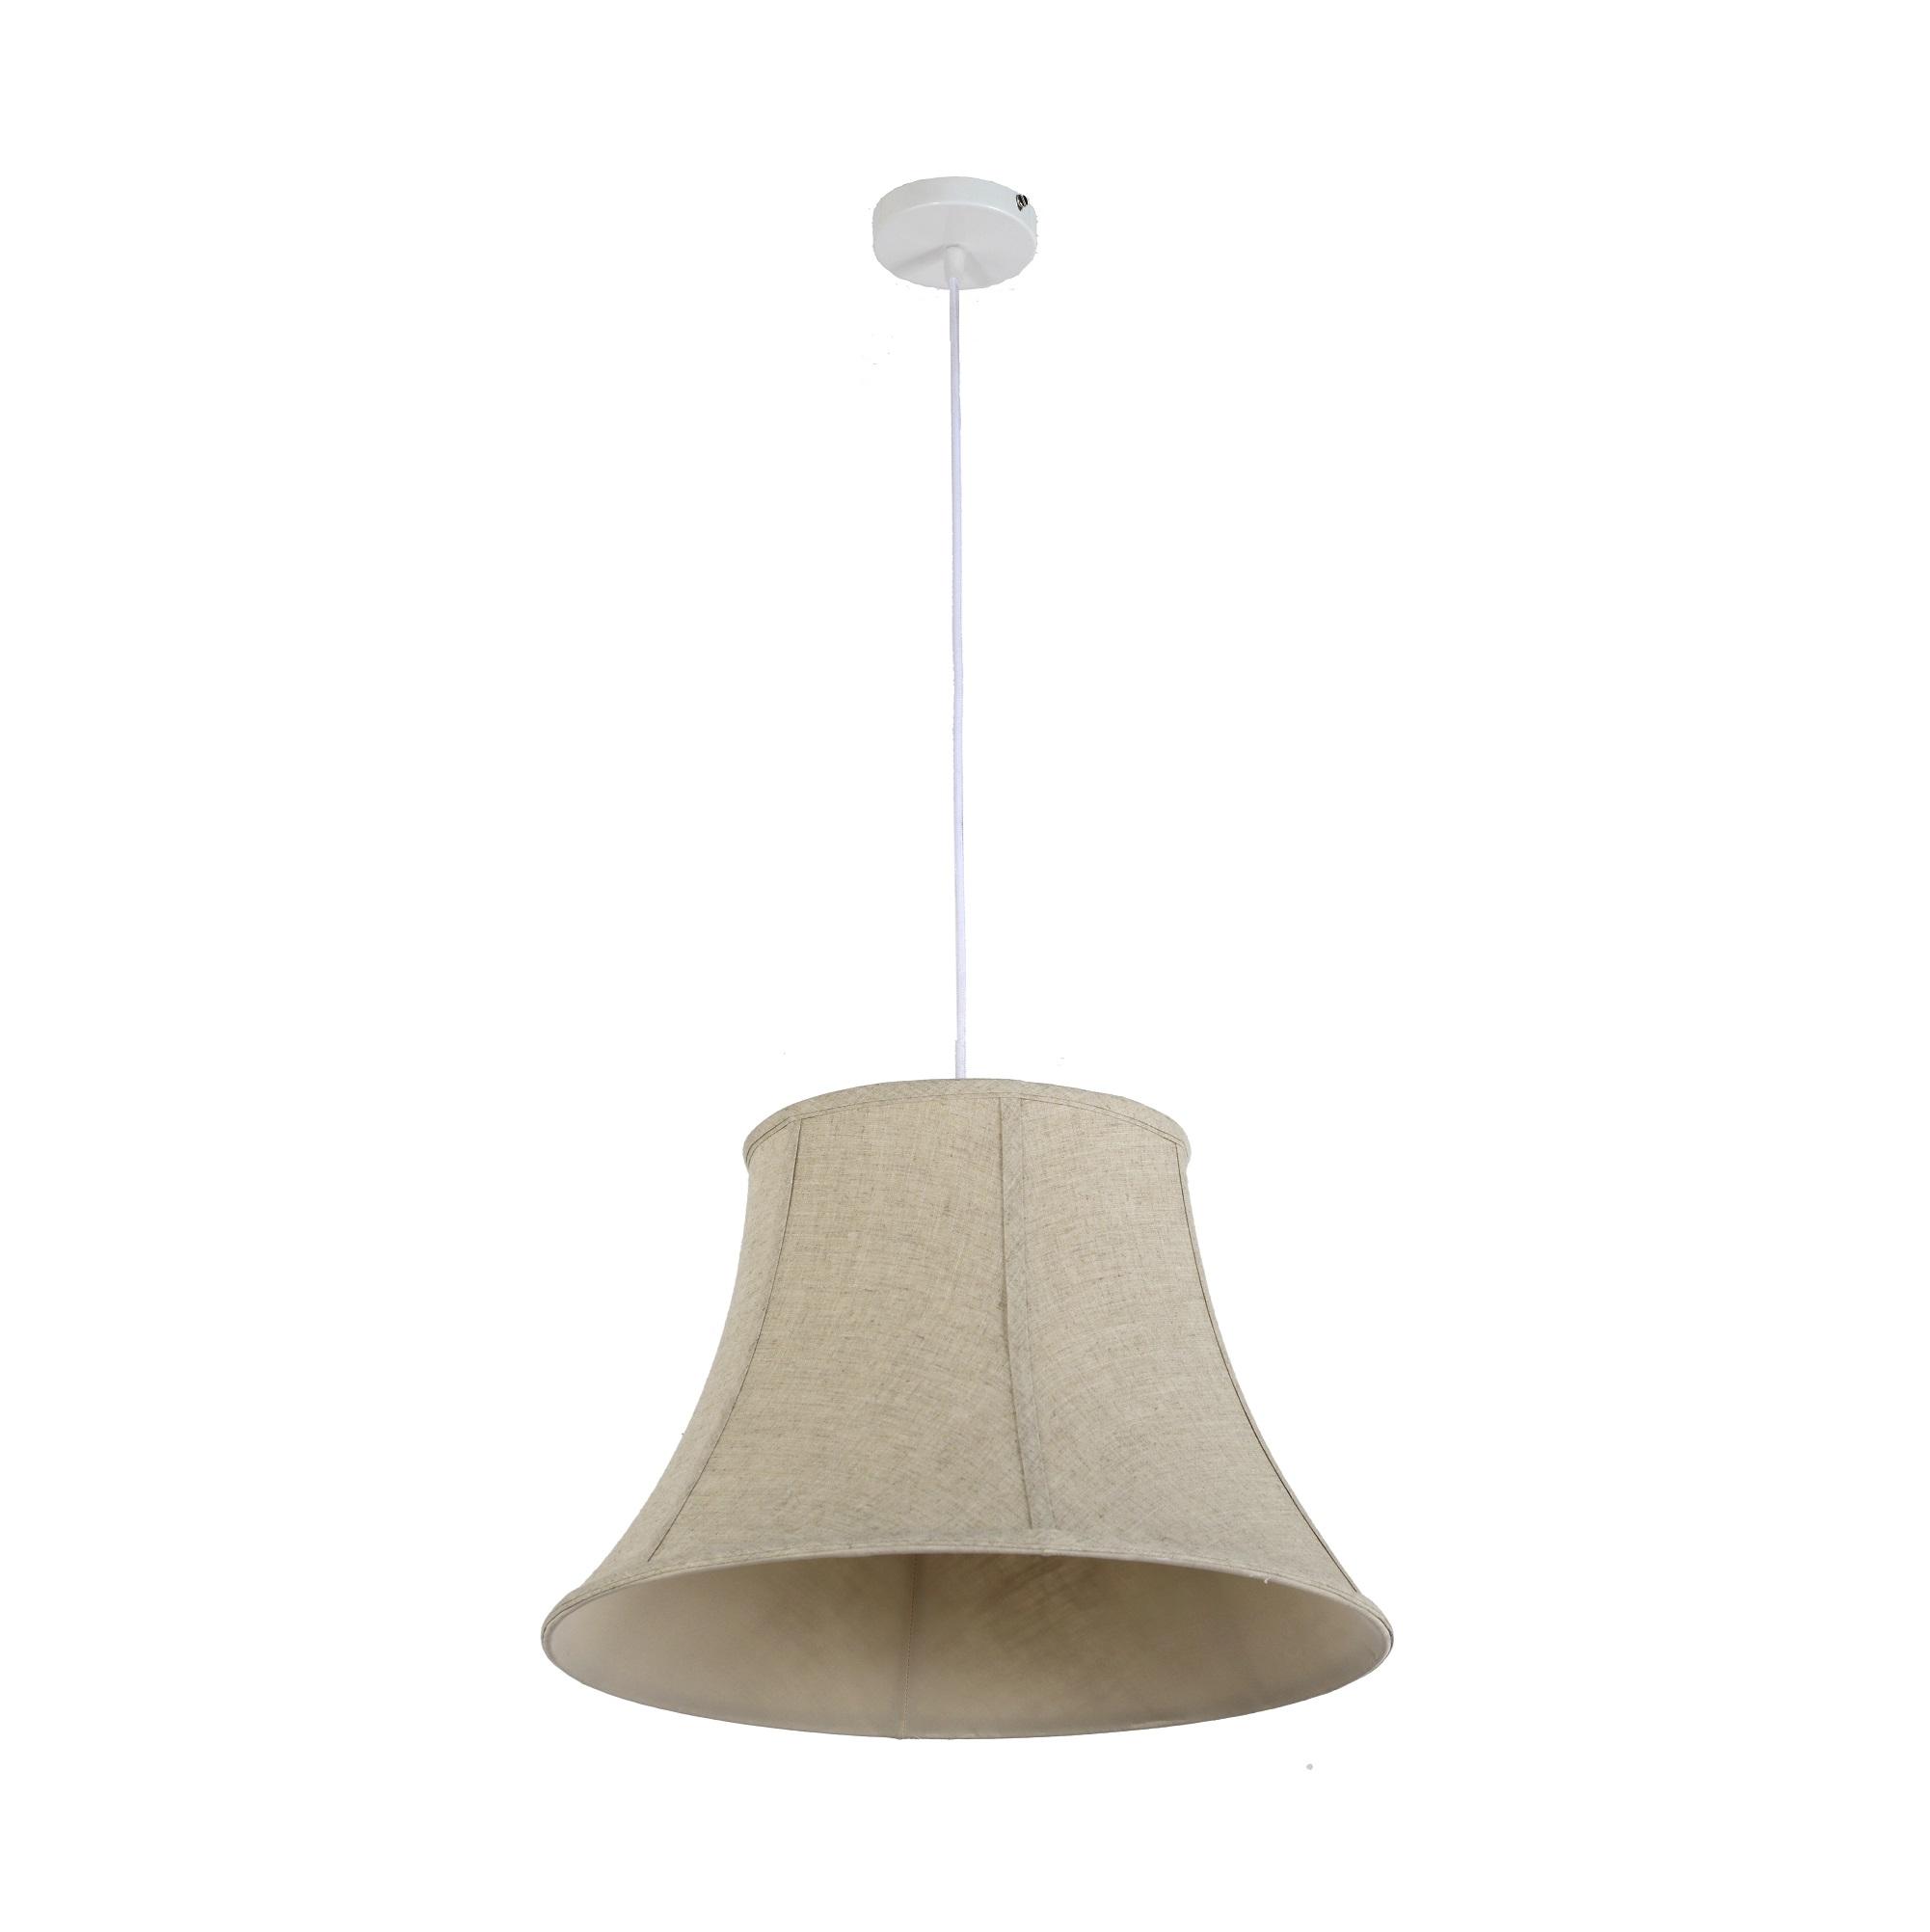 Фото - Подвесной светильник Arti Lampadari Cantare E 1.3.P1 LG подвесной светильник arti lampadari olio e 1 3 p1 br